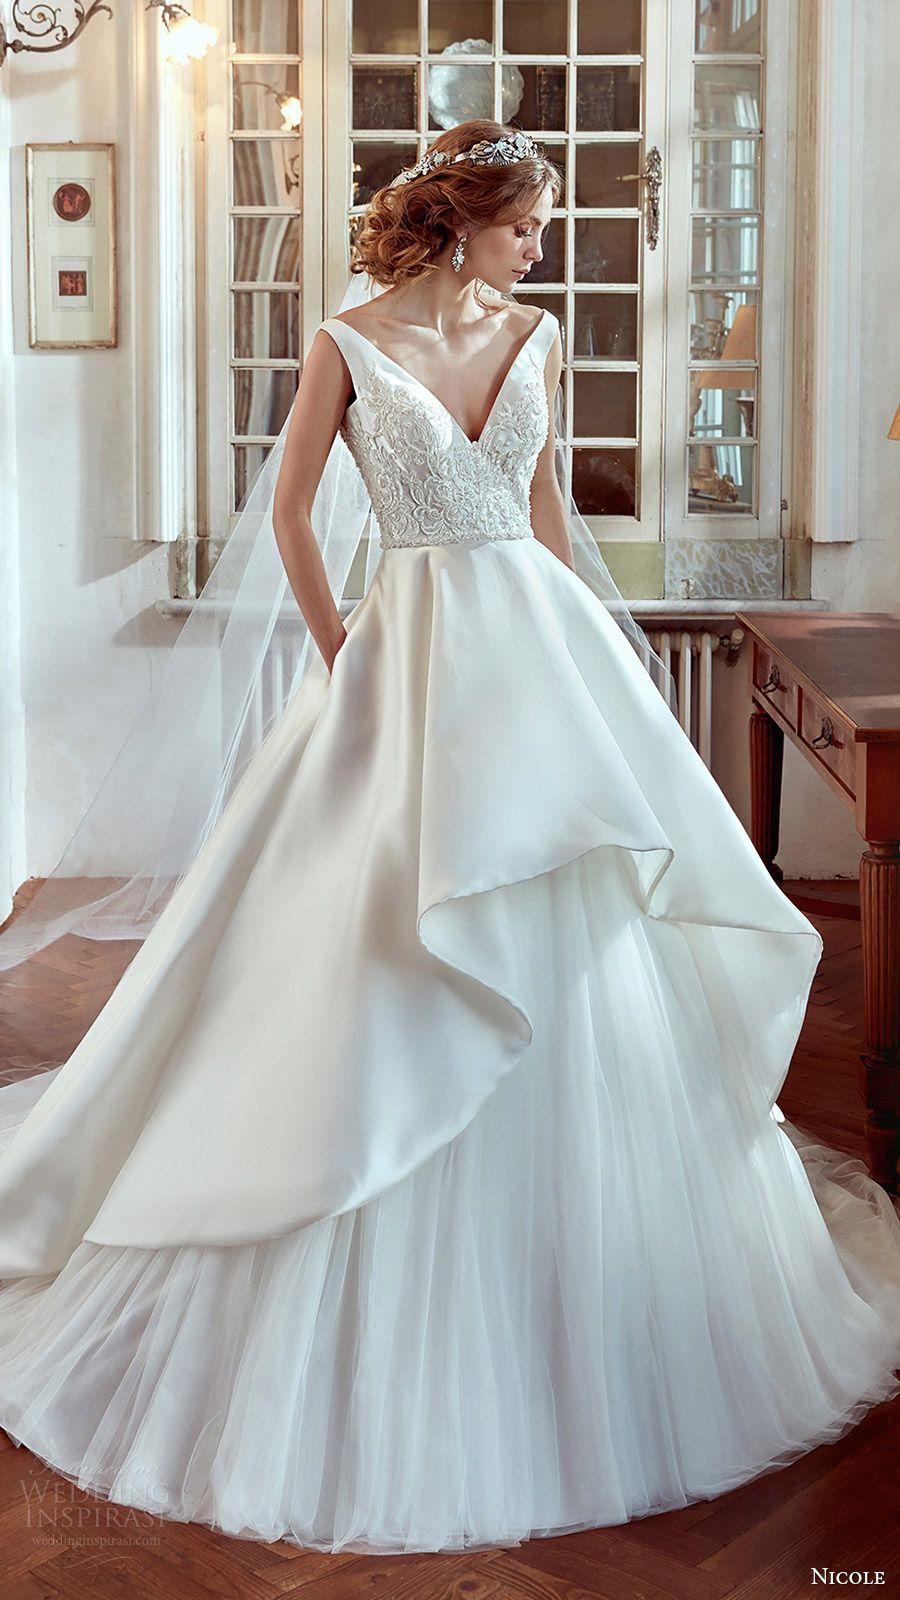 Nicole 2017 Wedding Dresses | Wedding dress, Weddings and Gowns